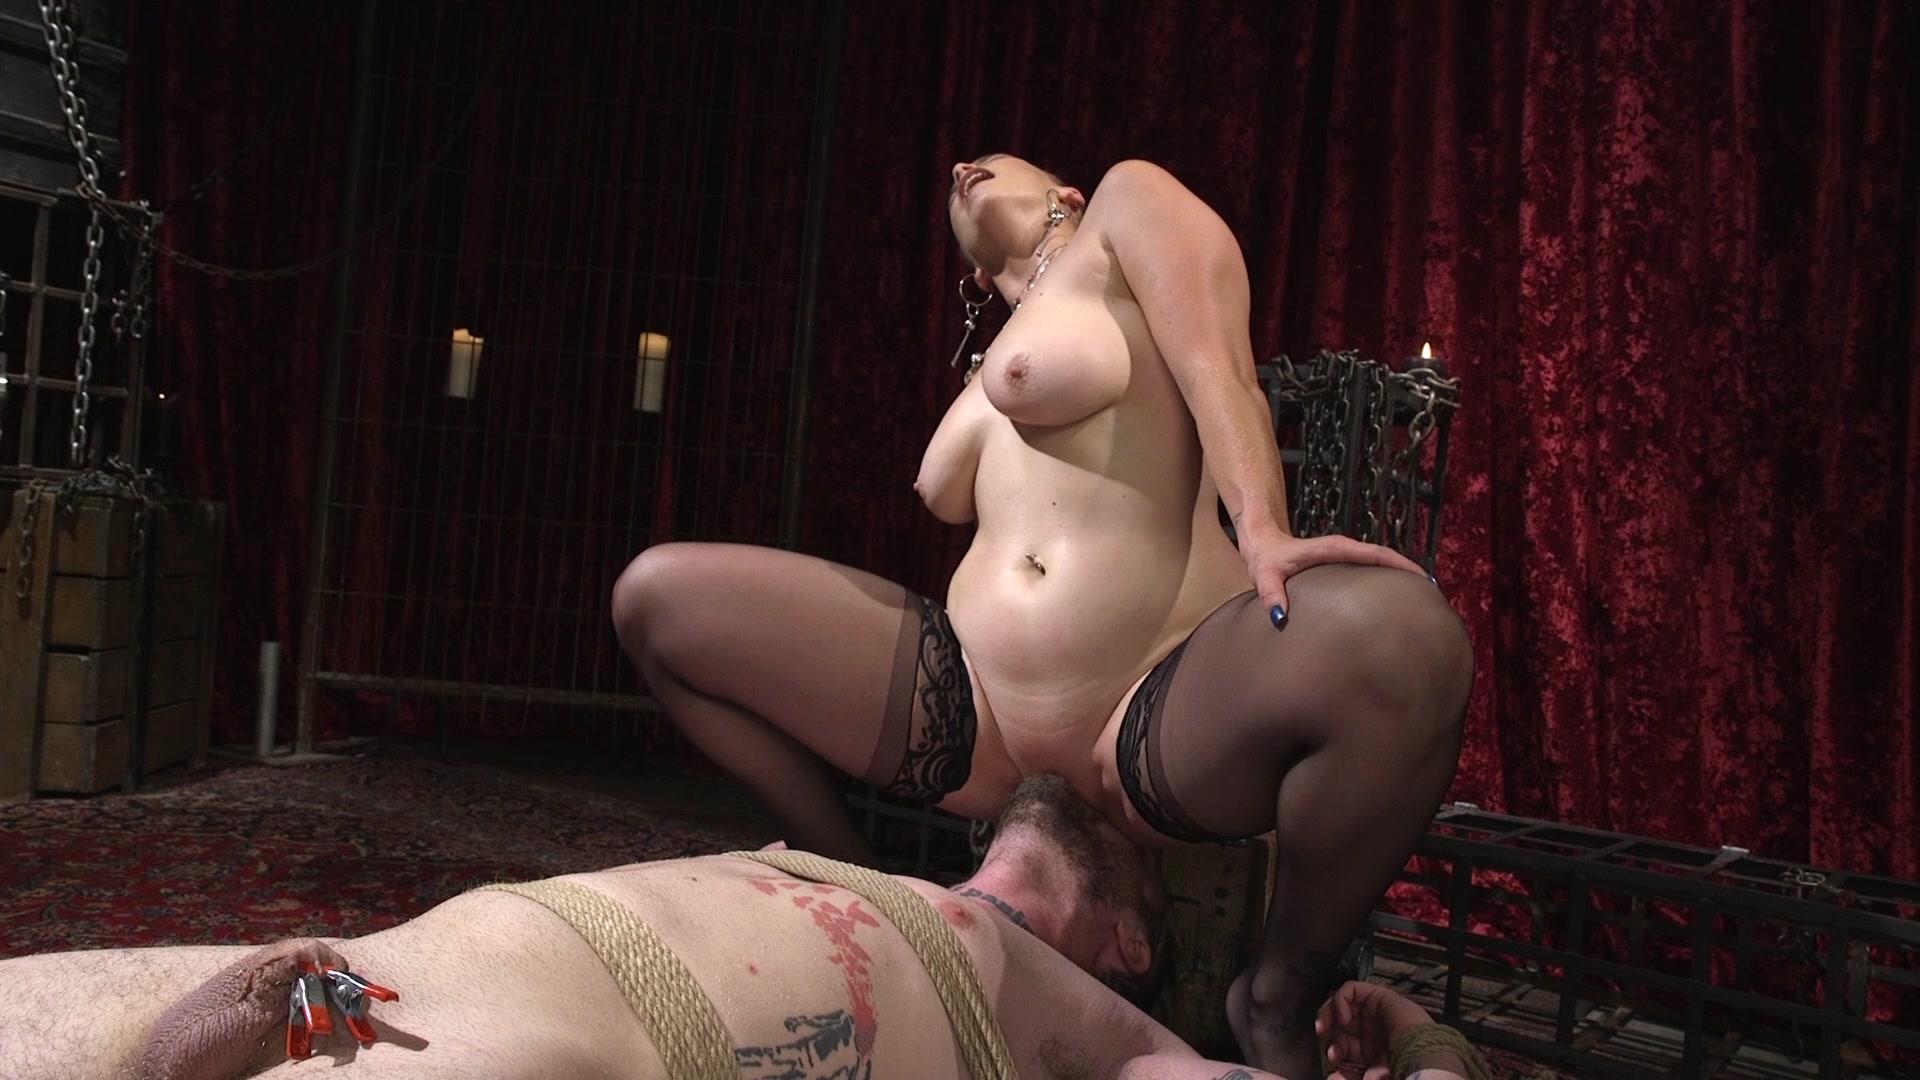 Venus lux and bella rossi